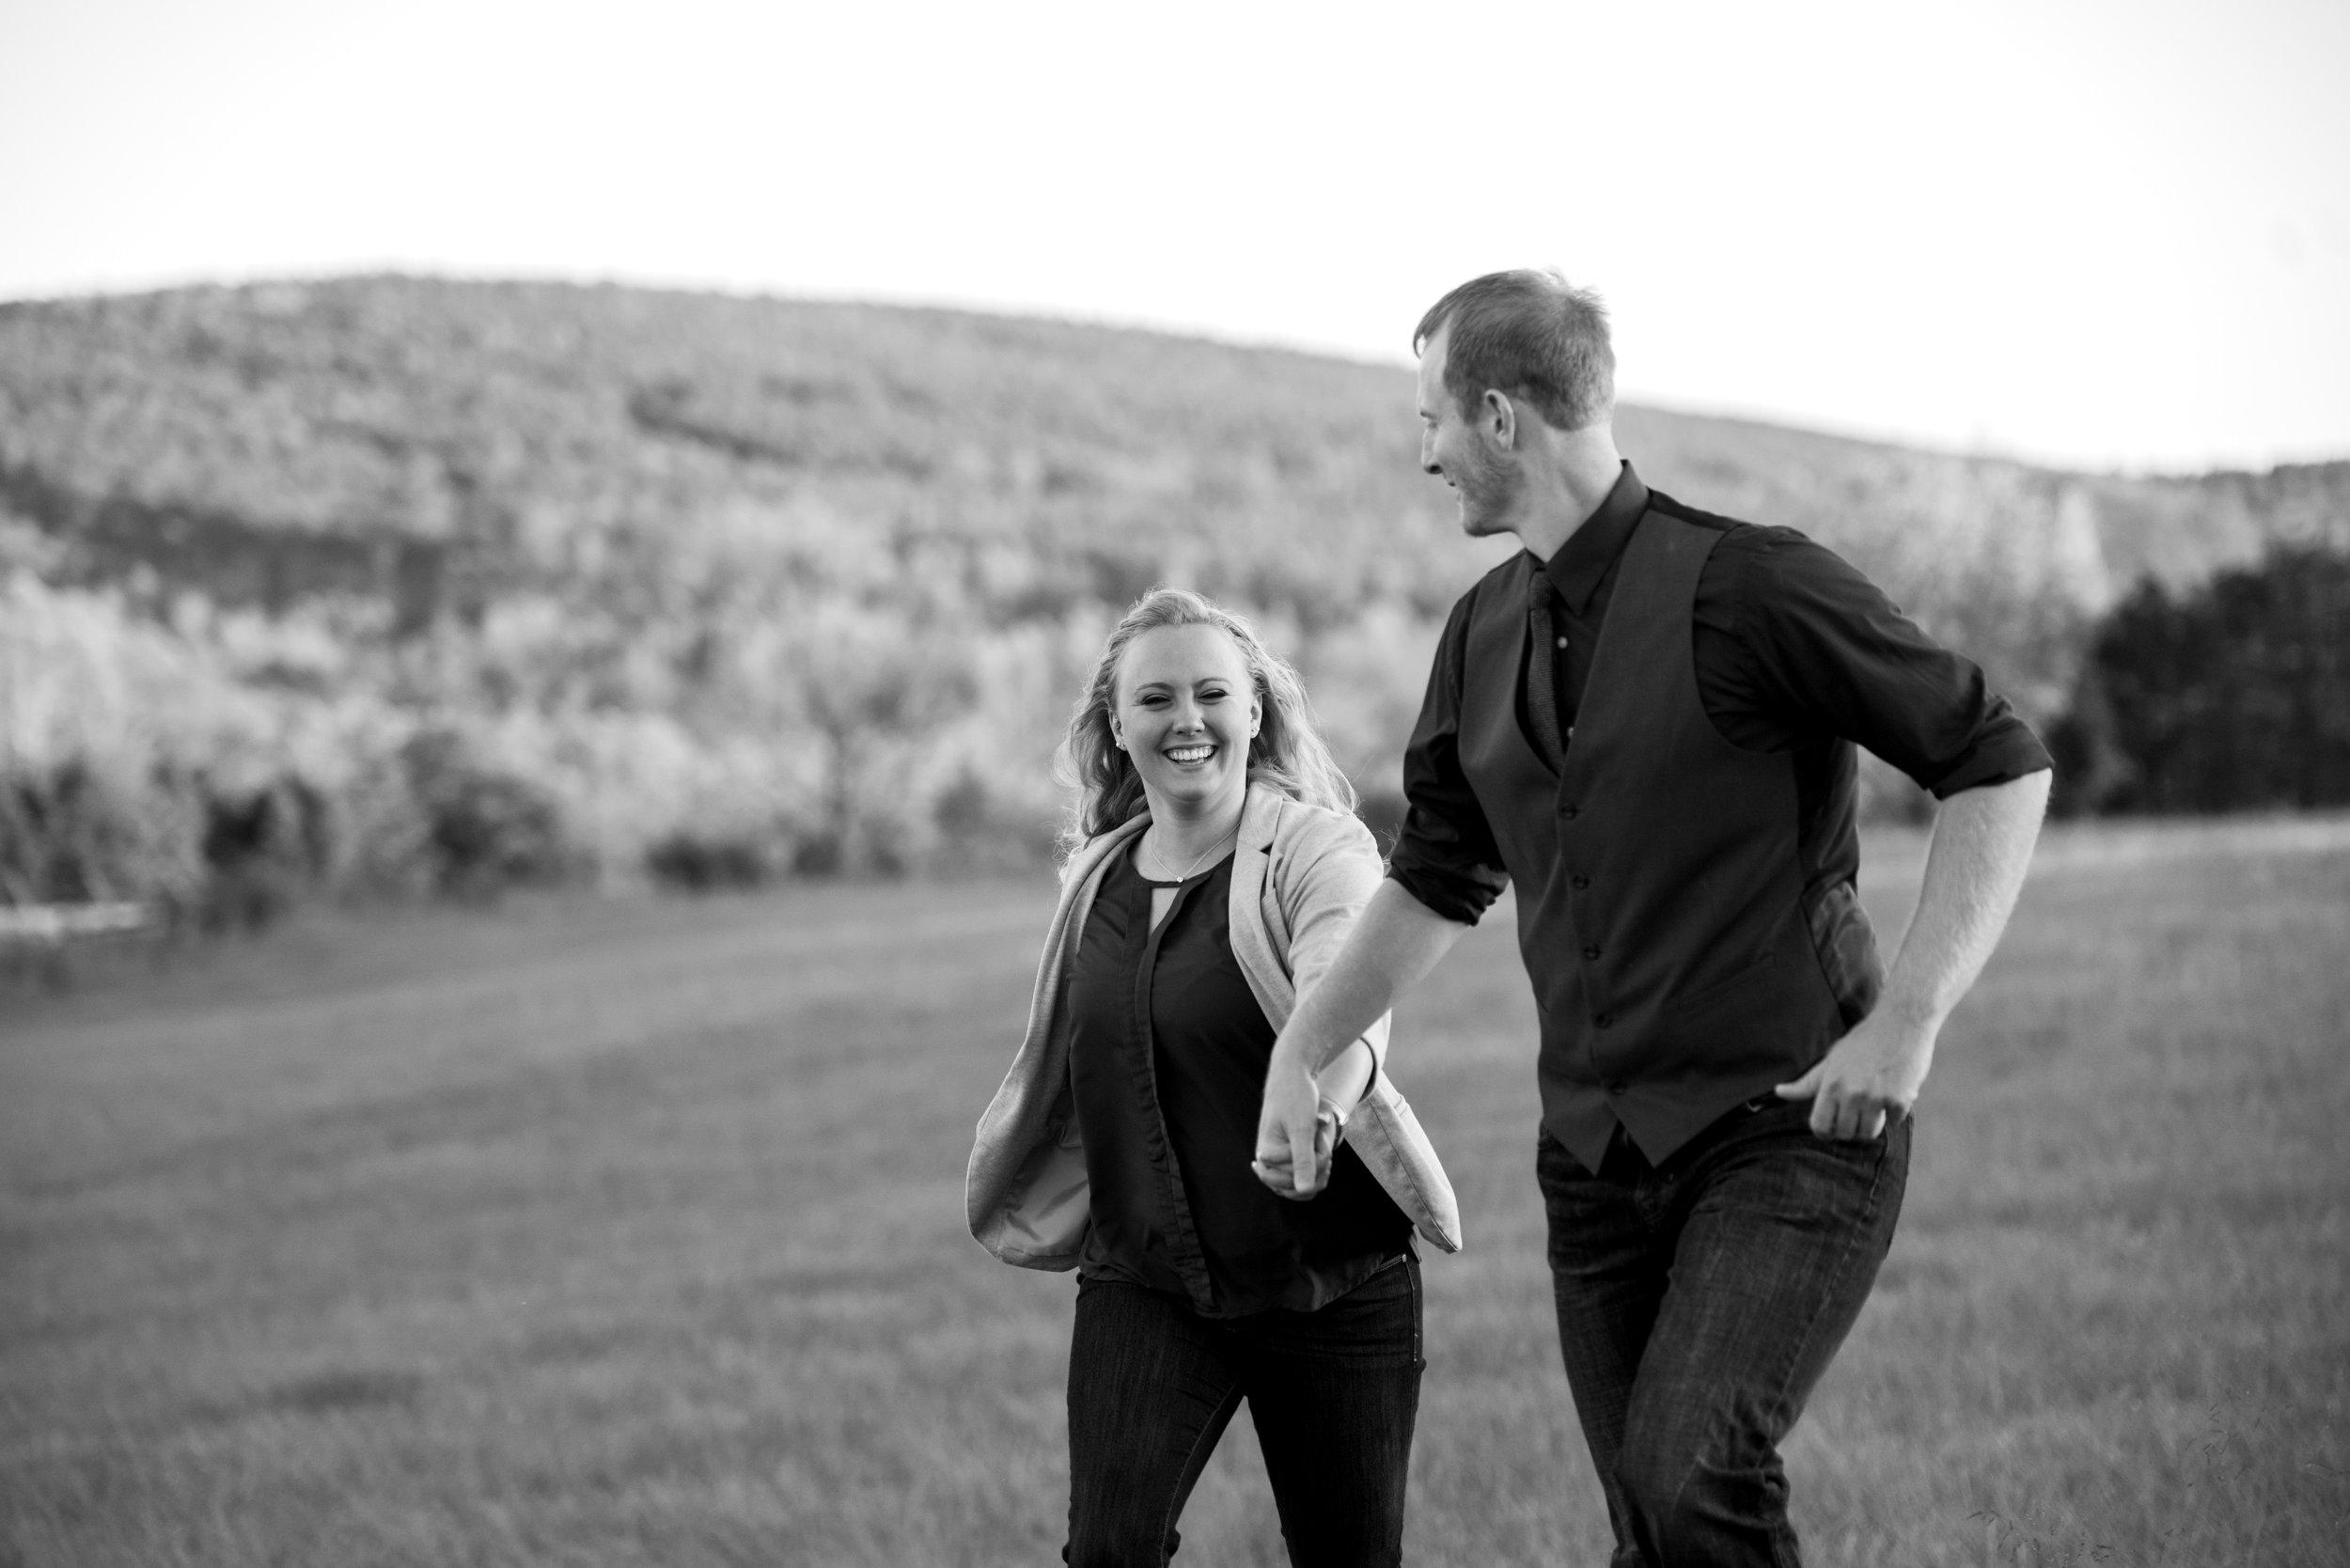 Lynchburg_College_Sorella_Farms_Baseball_Ballet_Virginia_Engagement_Session_Wedding_Photographers (79).jpg